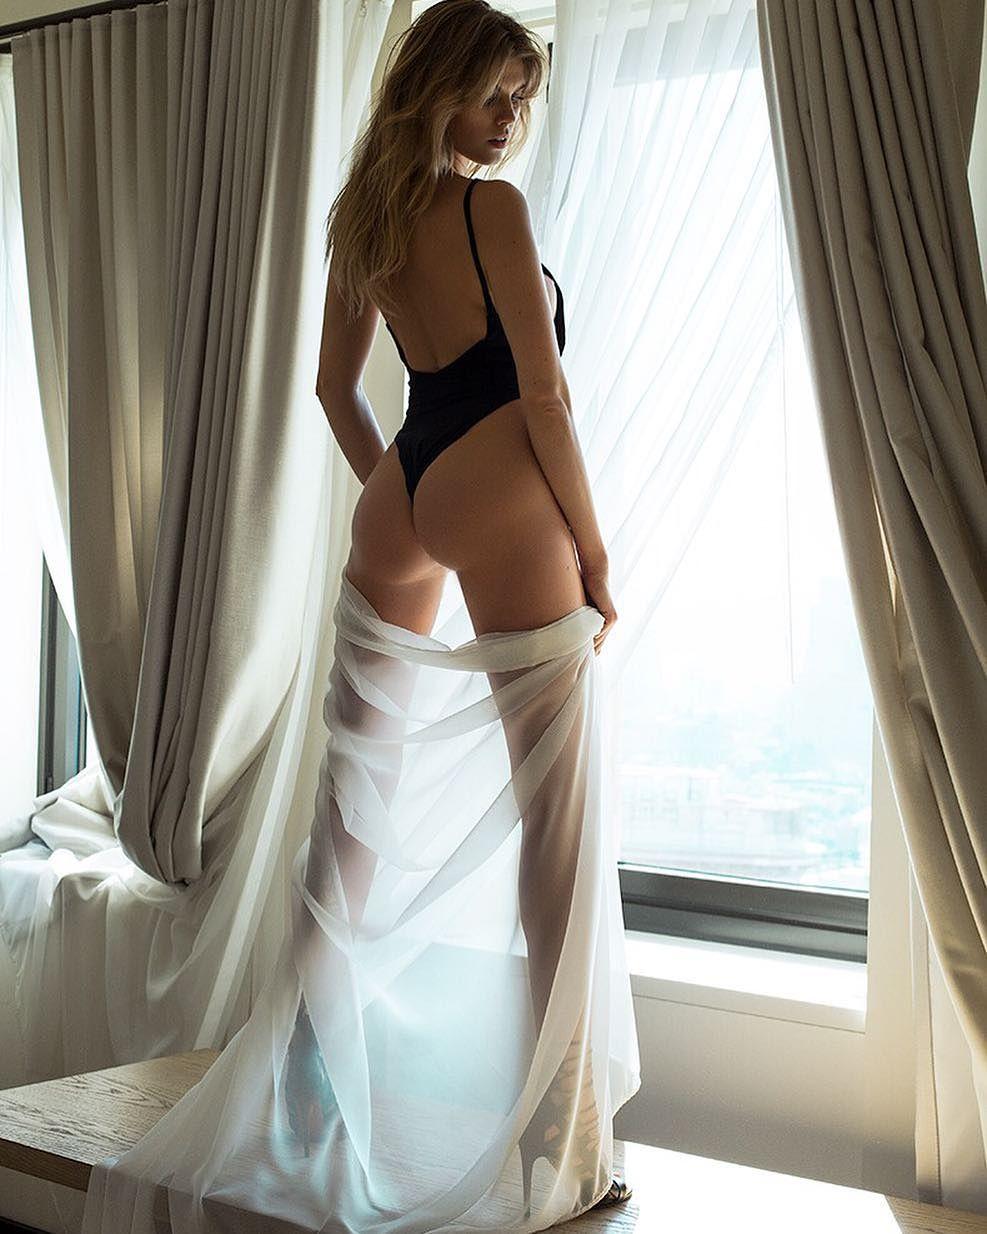 Monica bellucci sex in manuale damore scandalplanetcom - 3 part 10